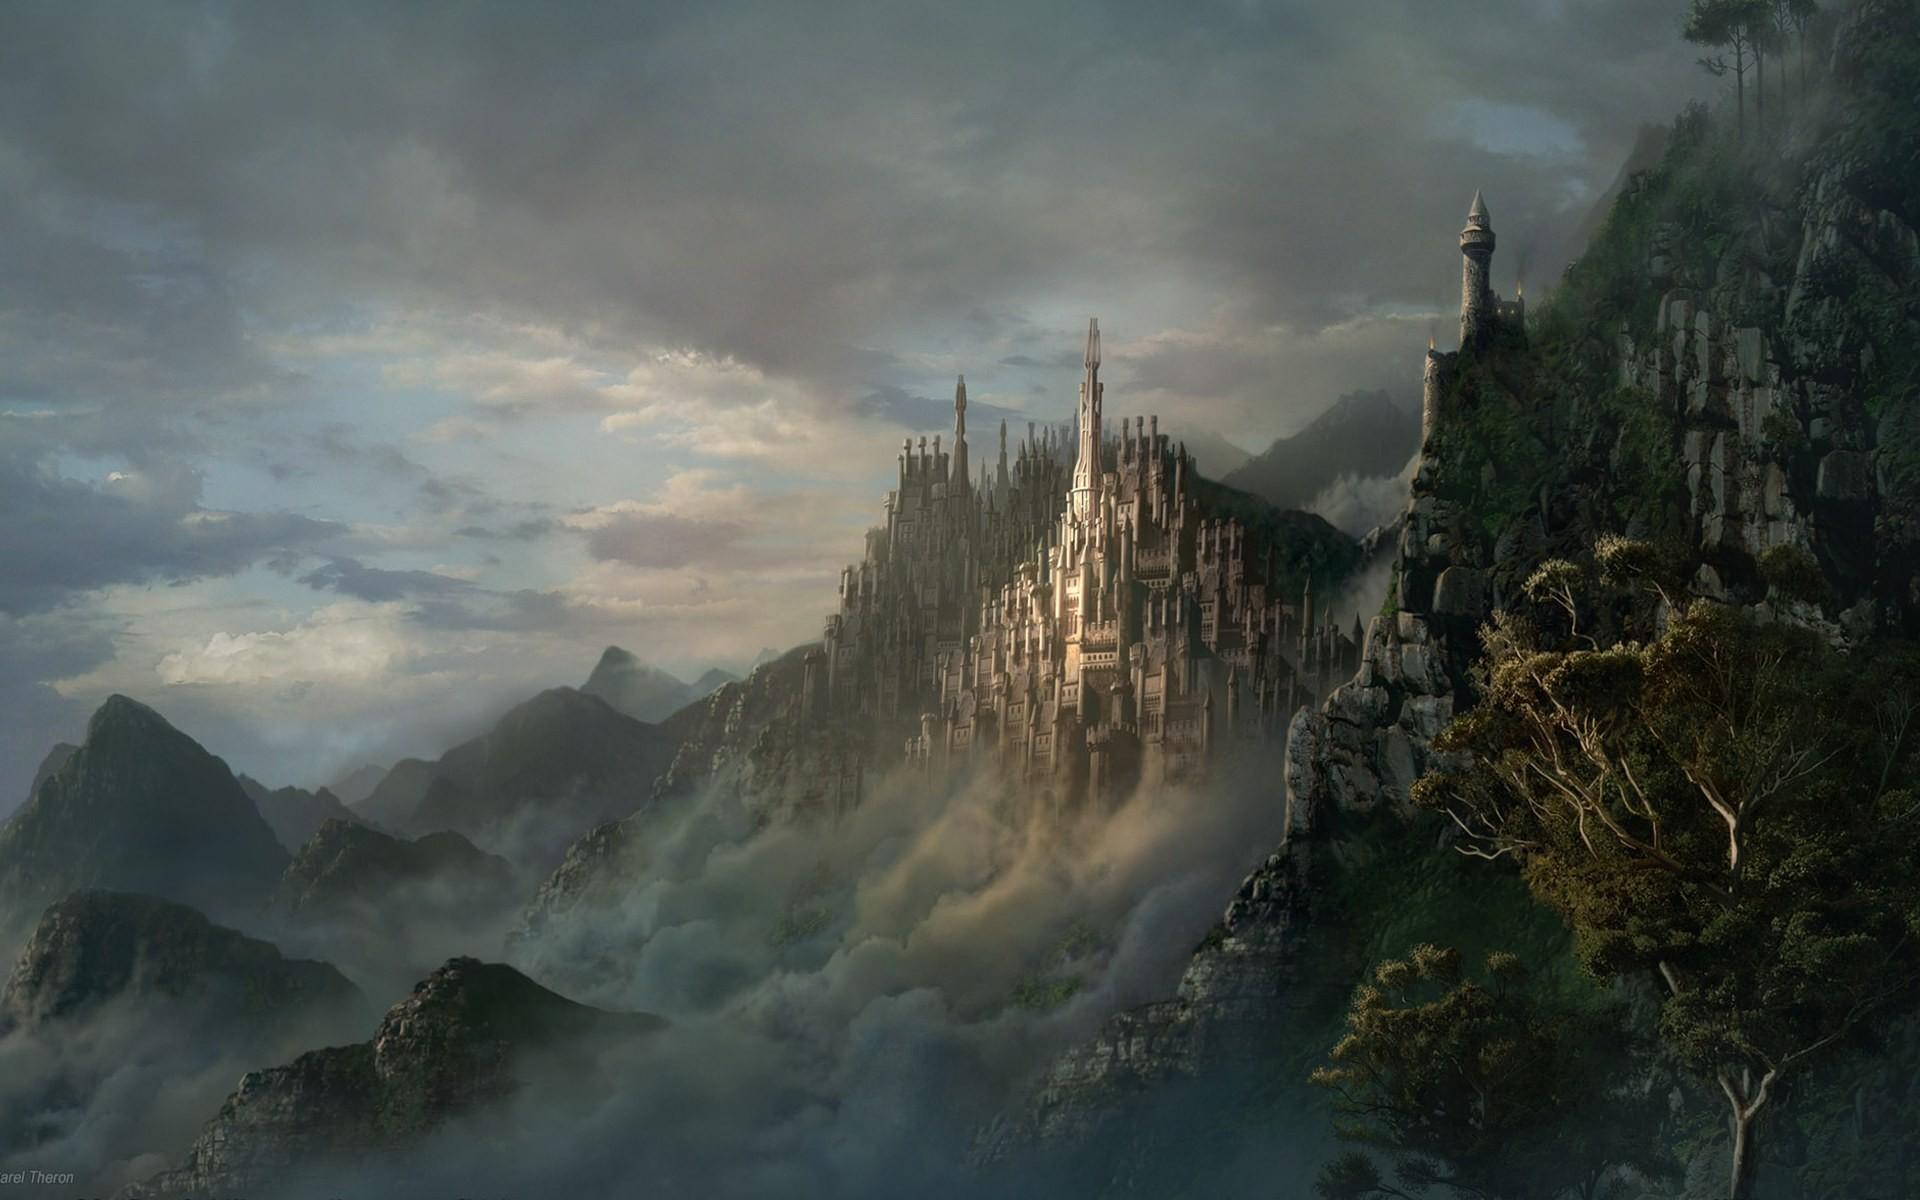 Hd fantasy wallpaper 74 images - Fantasy background ...